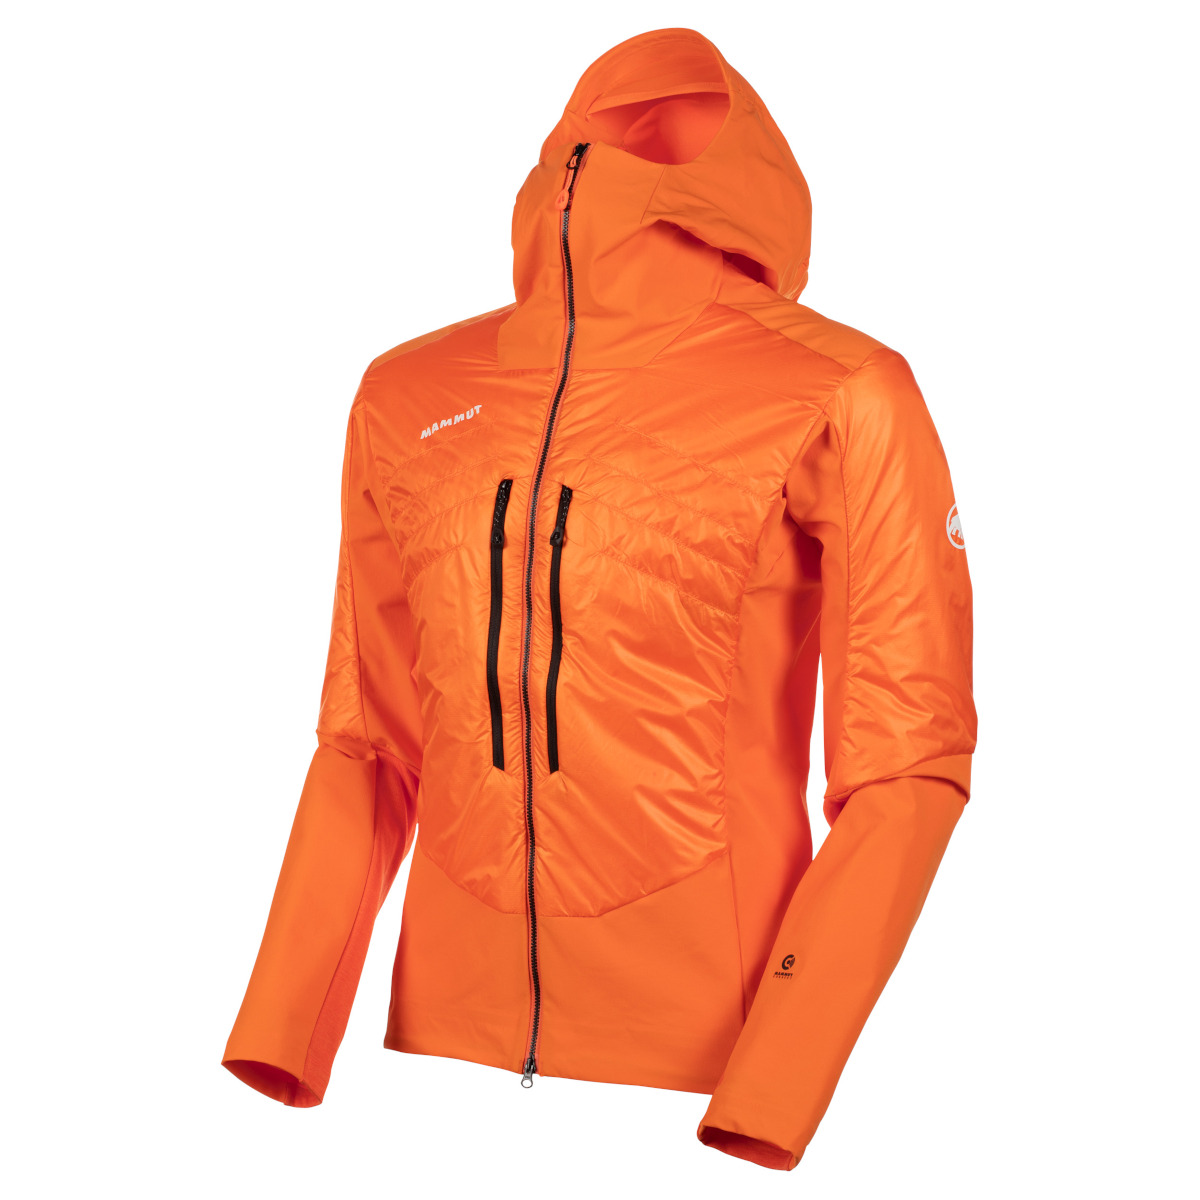 Mammut Eisfeld Softshell Hybrid Hooded Jacket Men - arumita